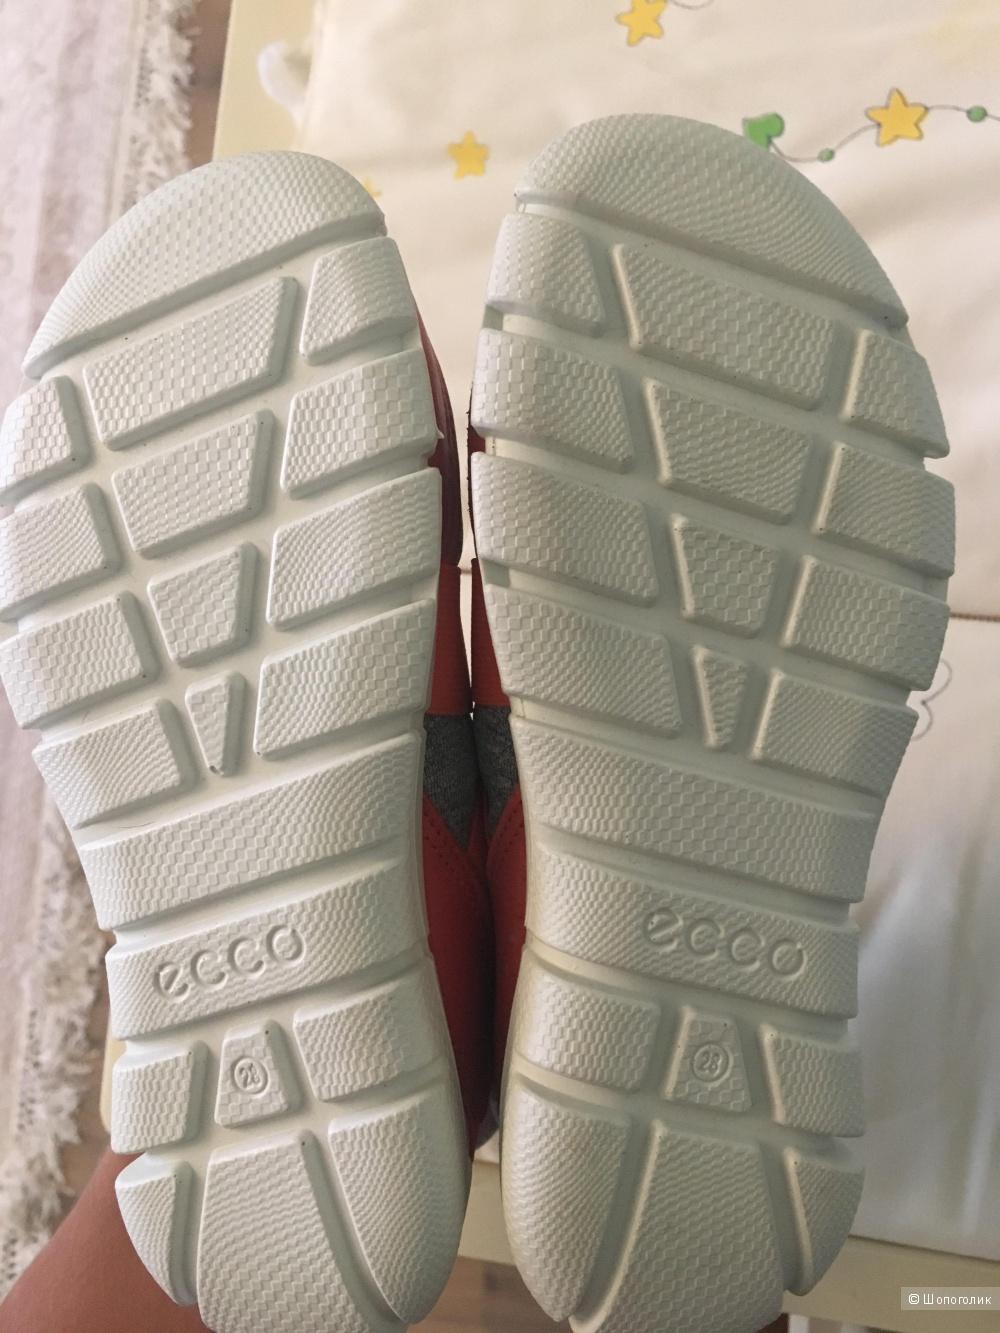 Кеды, фирма Ecco, 28 размер